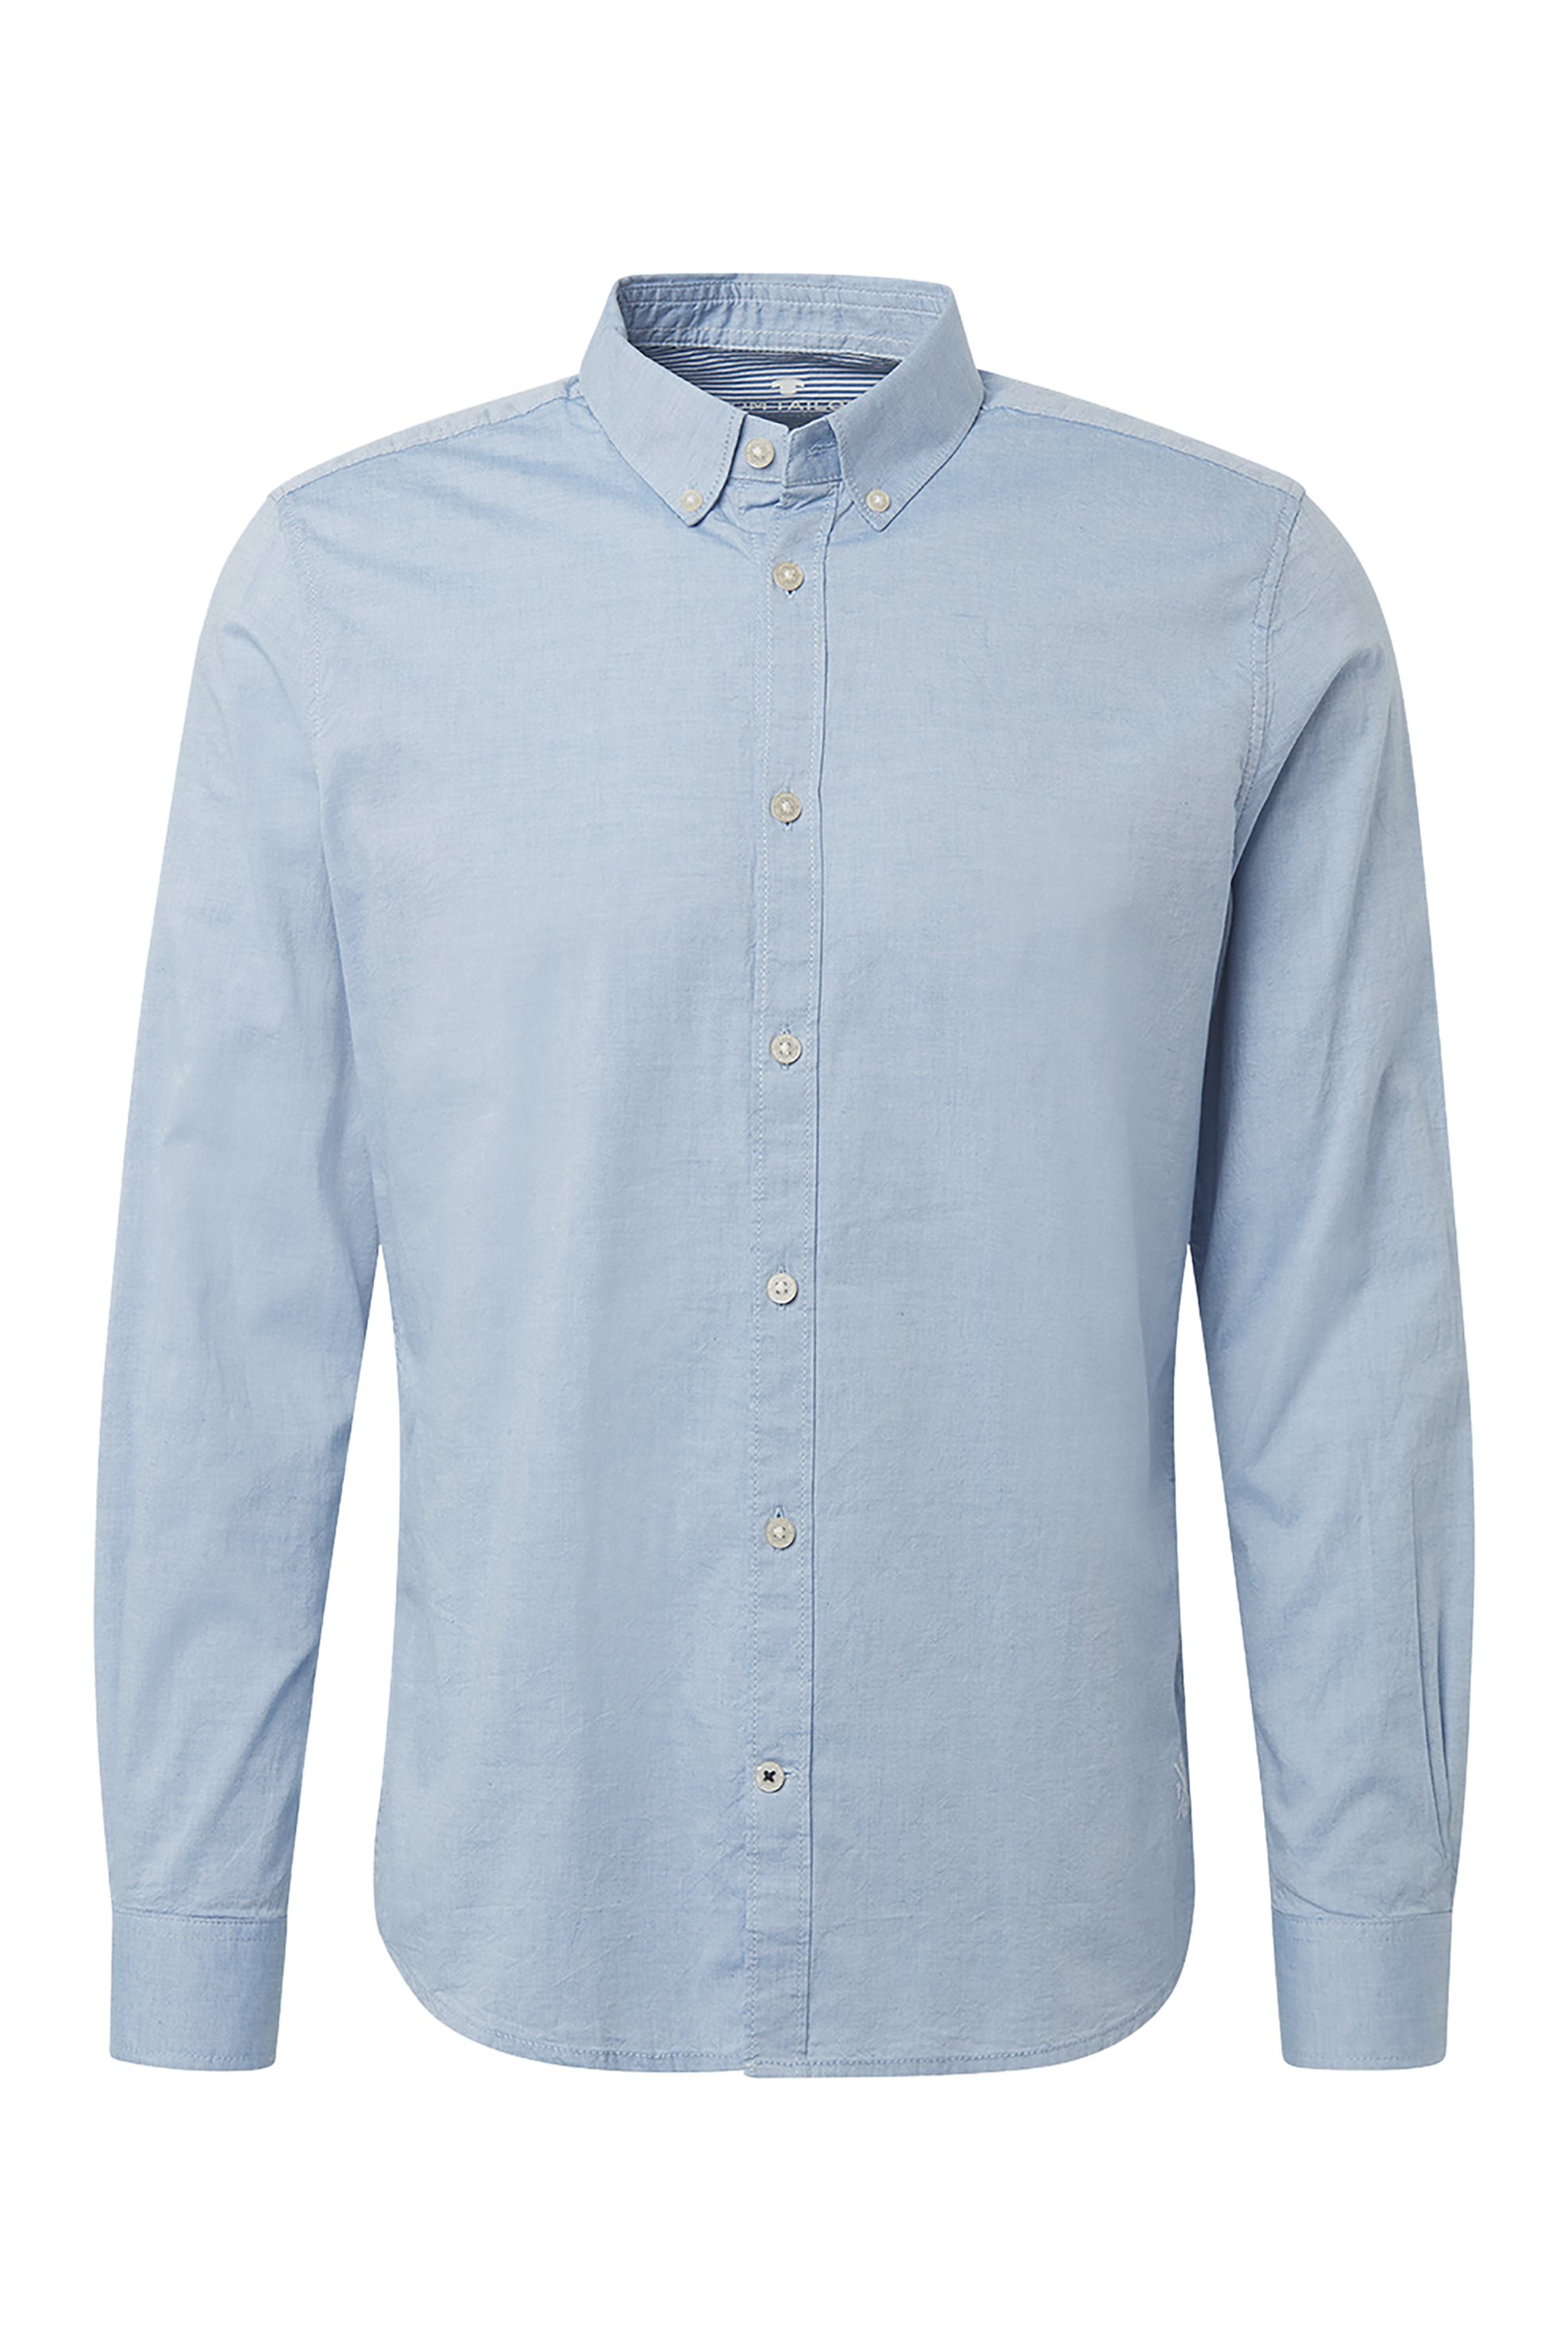 TOM TAILOR ανδρικό πουκάμισο Slim fit - 1008320 - Γαλάζιο ανδρασ   ρουχα   πουκάμισα   casual